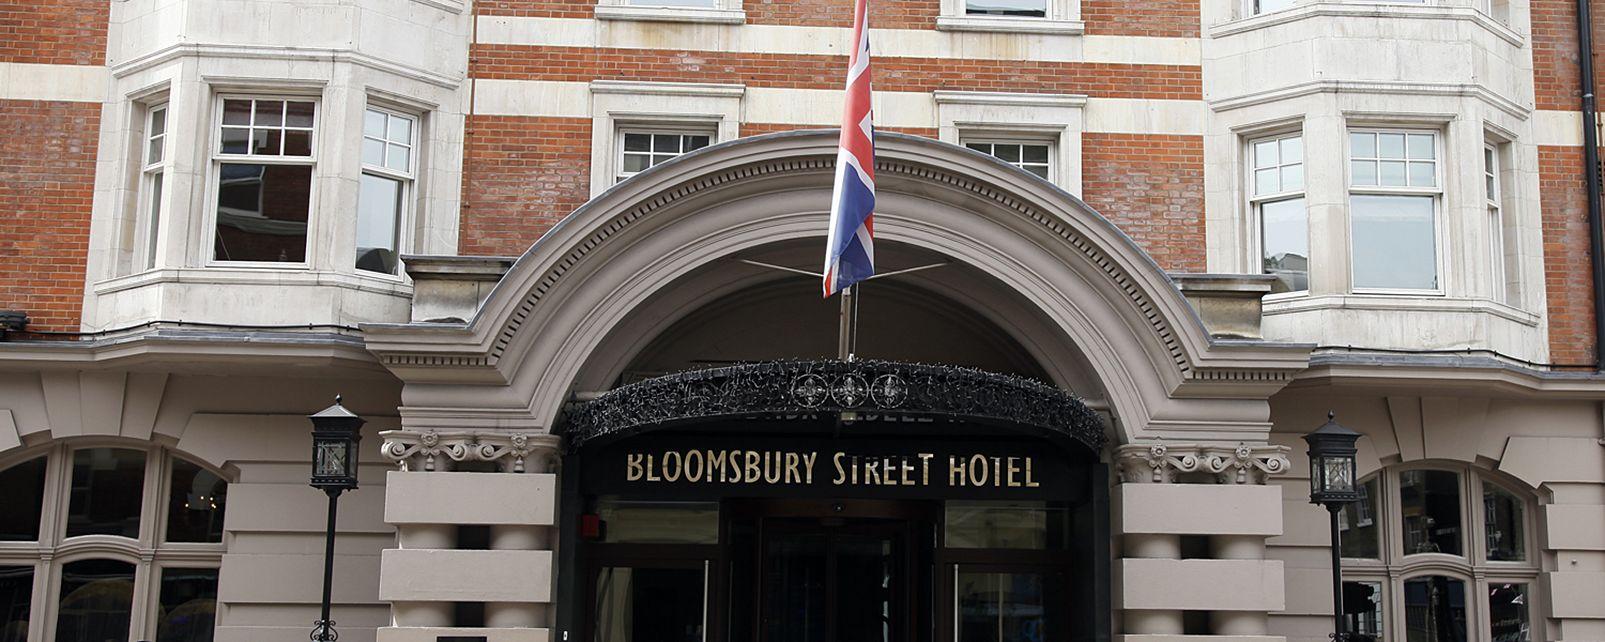 Hôtel Radisson Edwardian Bloomsbury Street